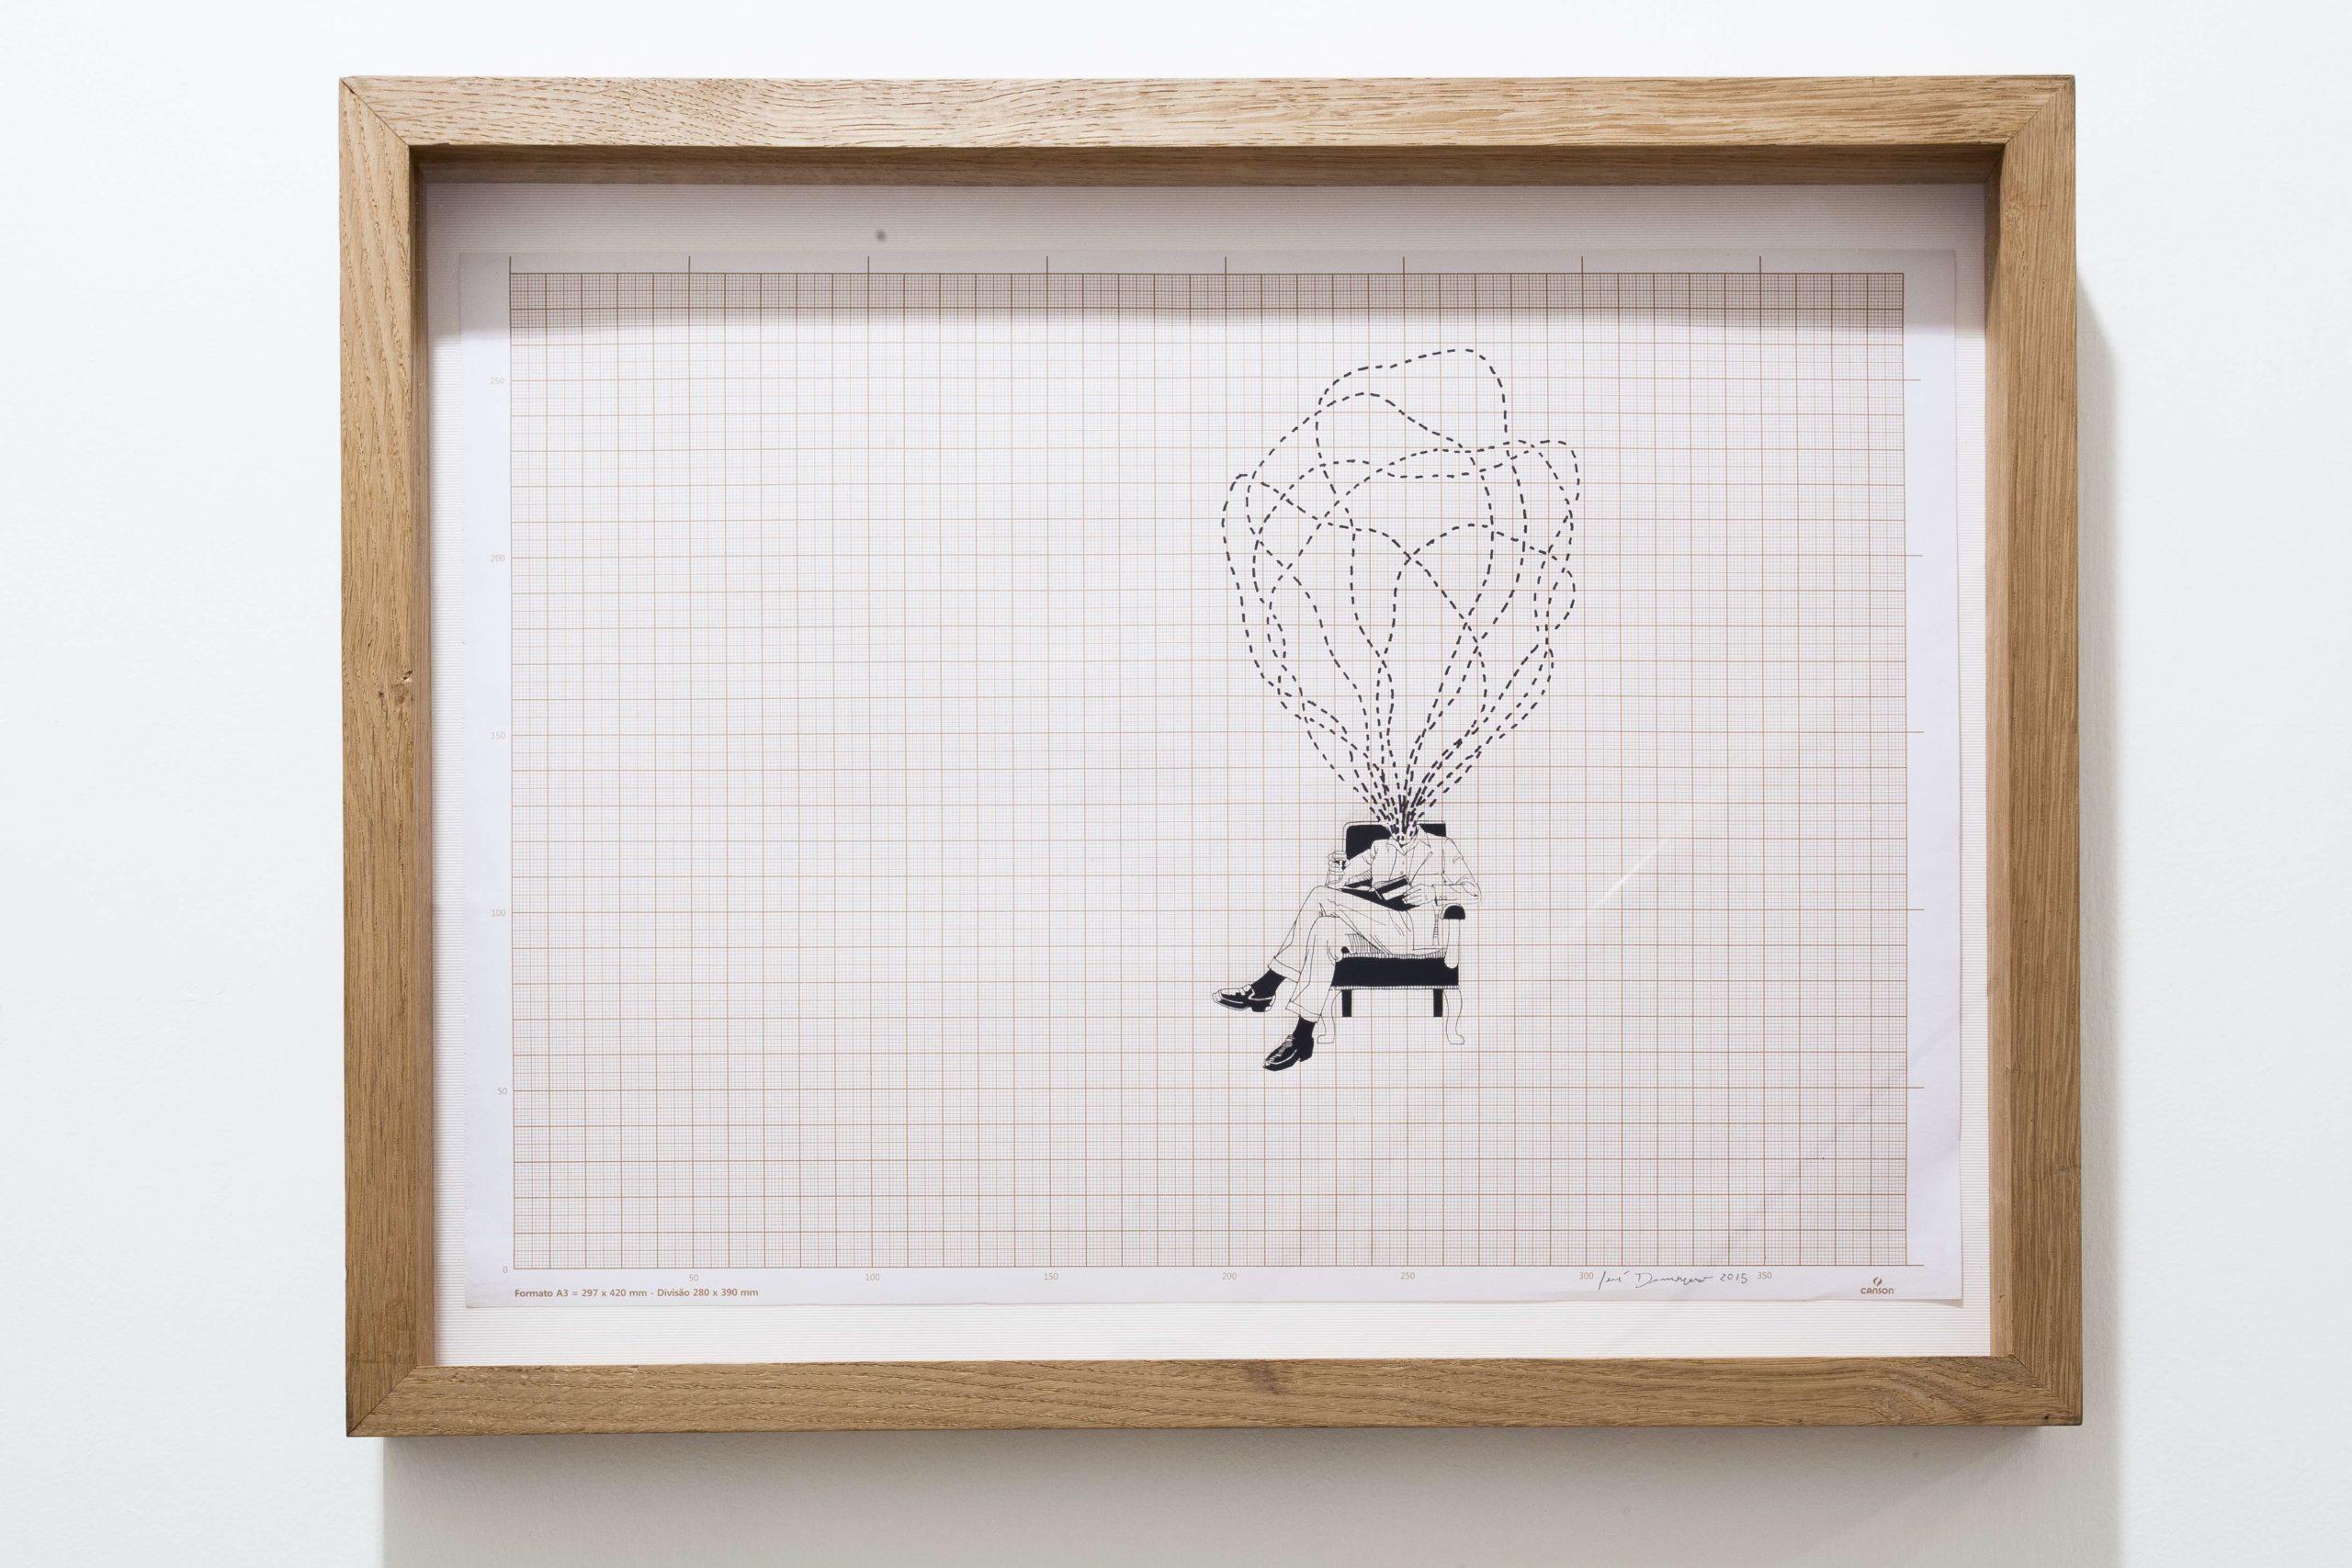 """Senza titolo"" 2015, china e letraset su carta millimetrata, 30 x 40 cm"